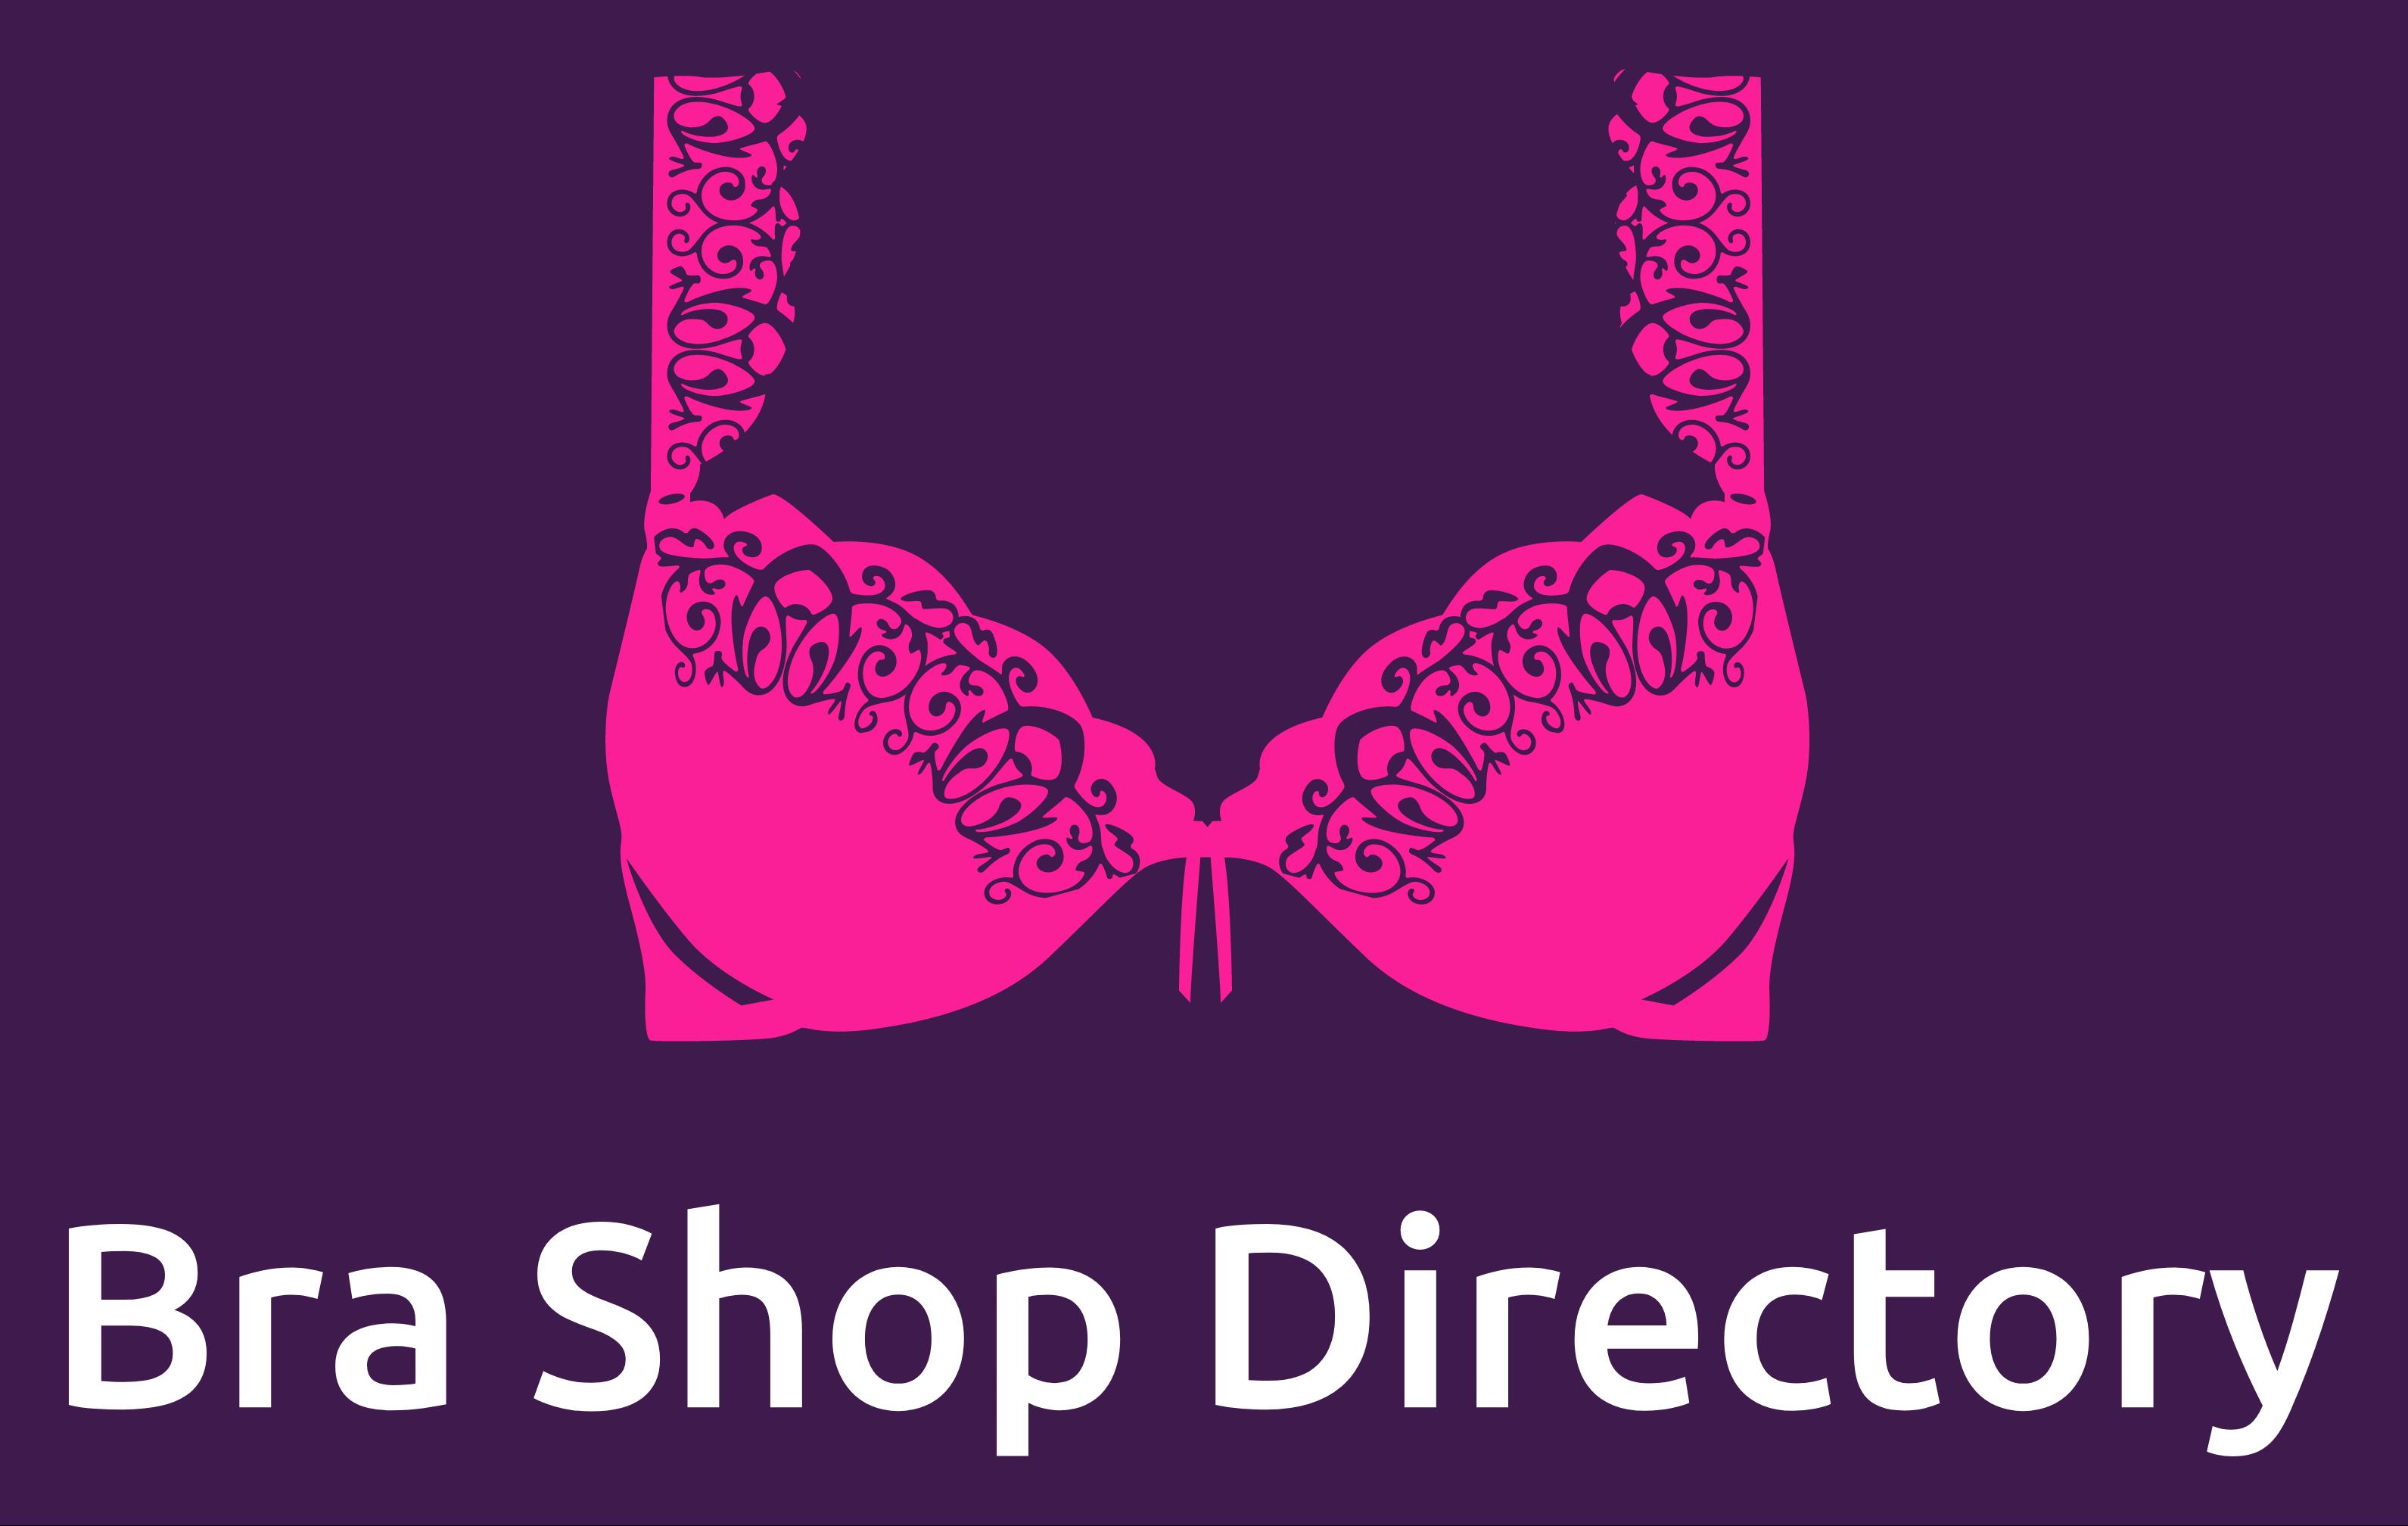 Bra Shop Directory - Pink and Purple logo